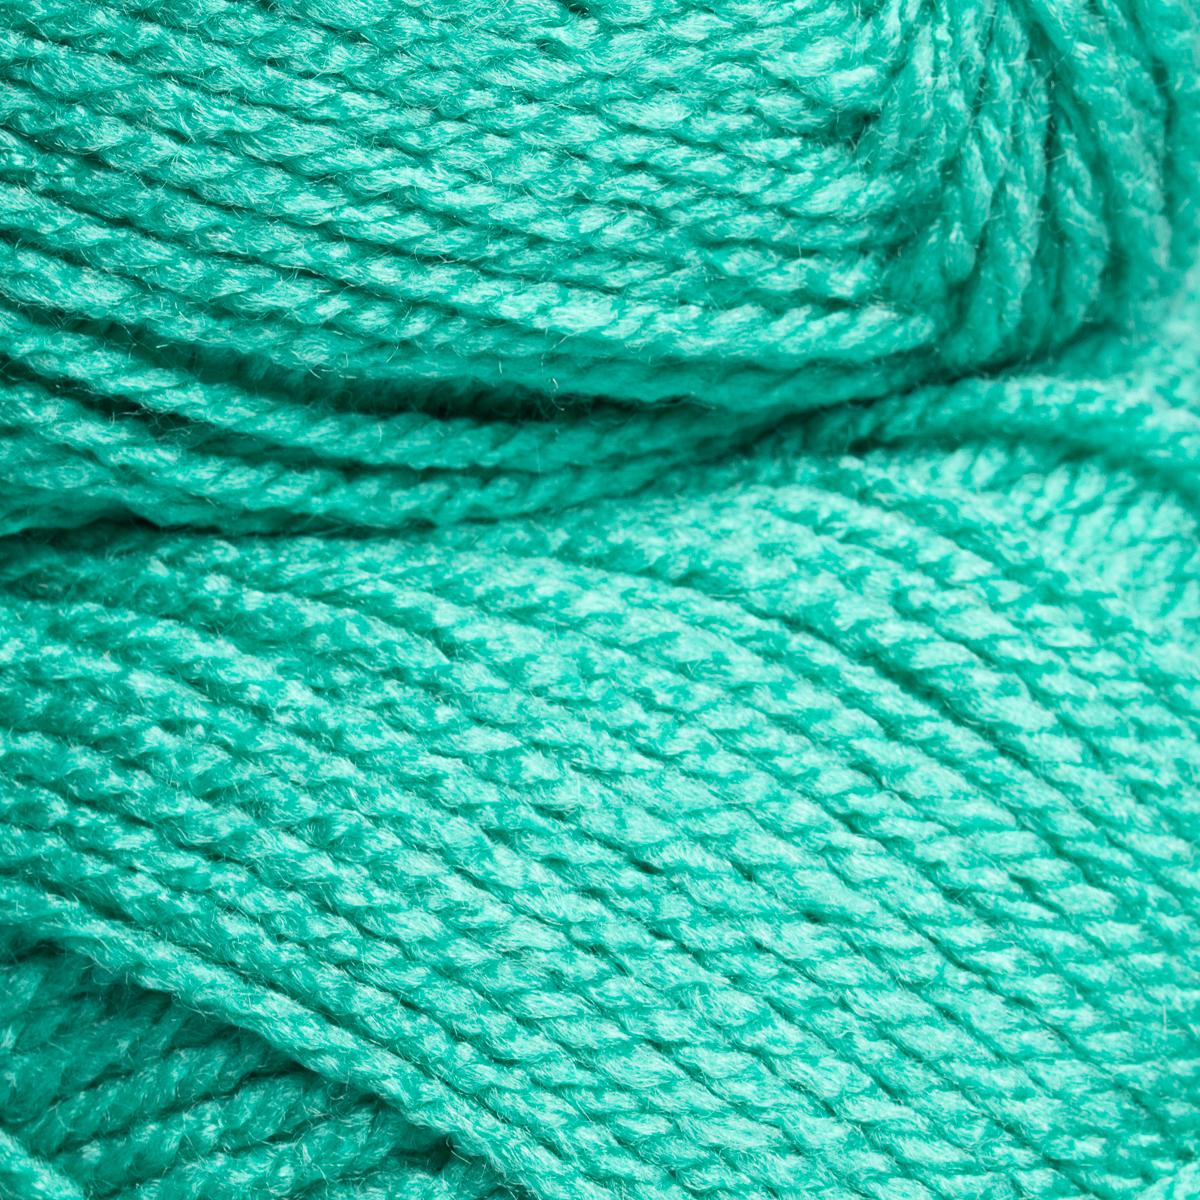 4-Dream-Weaver-Solid-S-Twist-100-Acrylic-Yarn-Skeins-Light-3-Knit-Crochet-Soft thumbnail 22